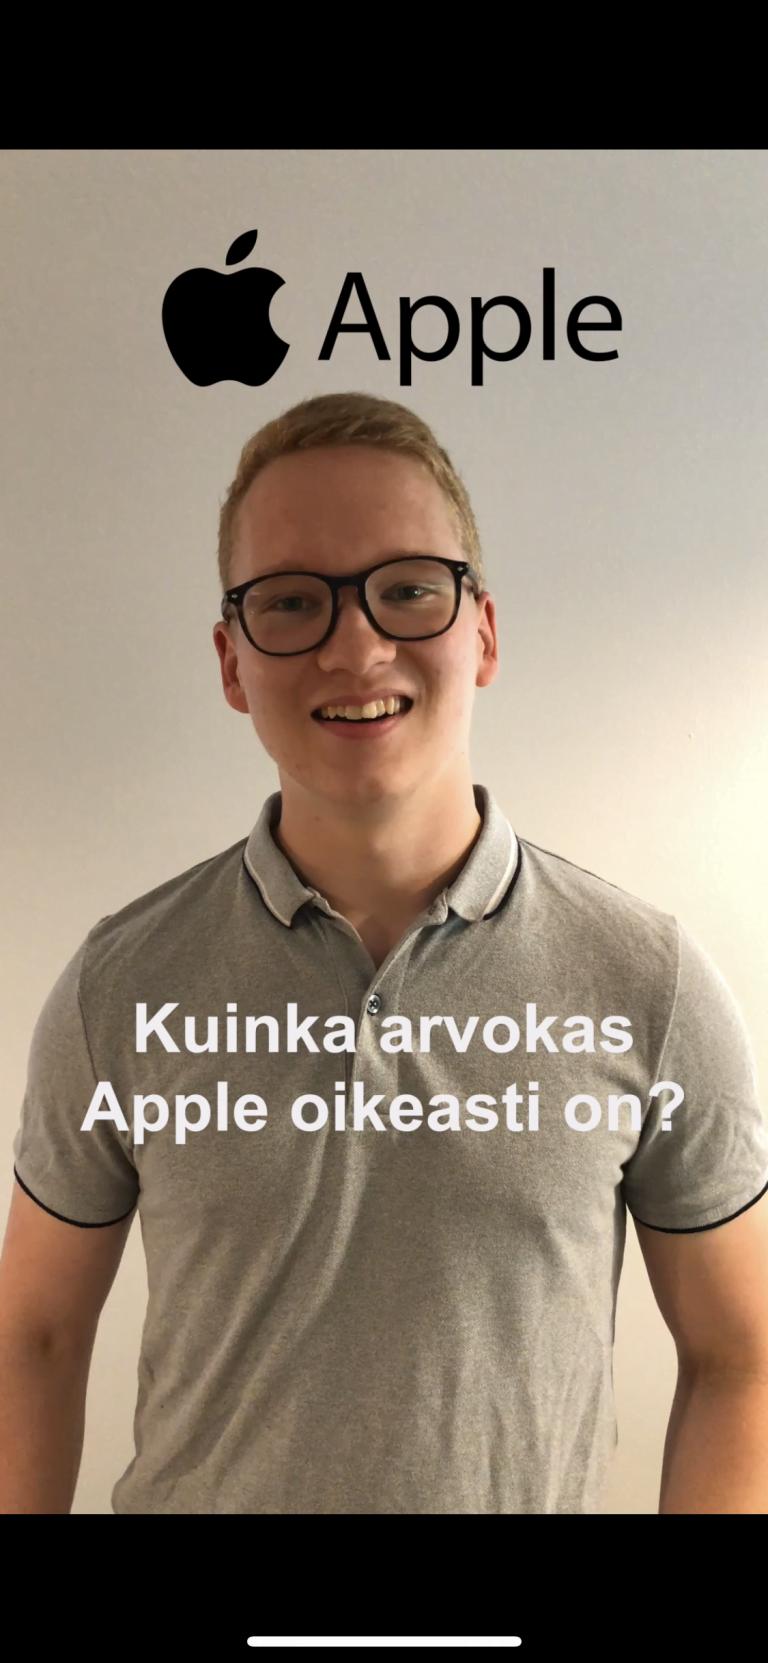 Kuinka arvokas Apple oikeasti on?